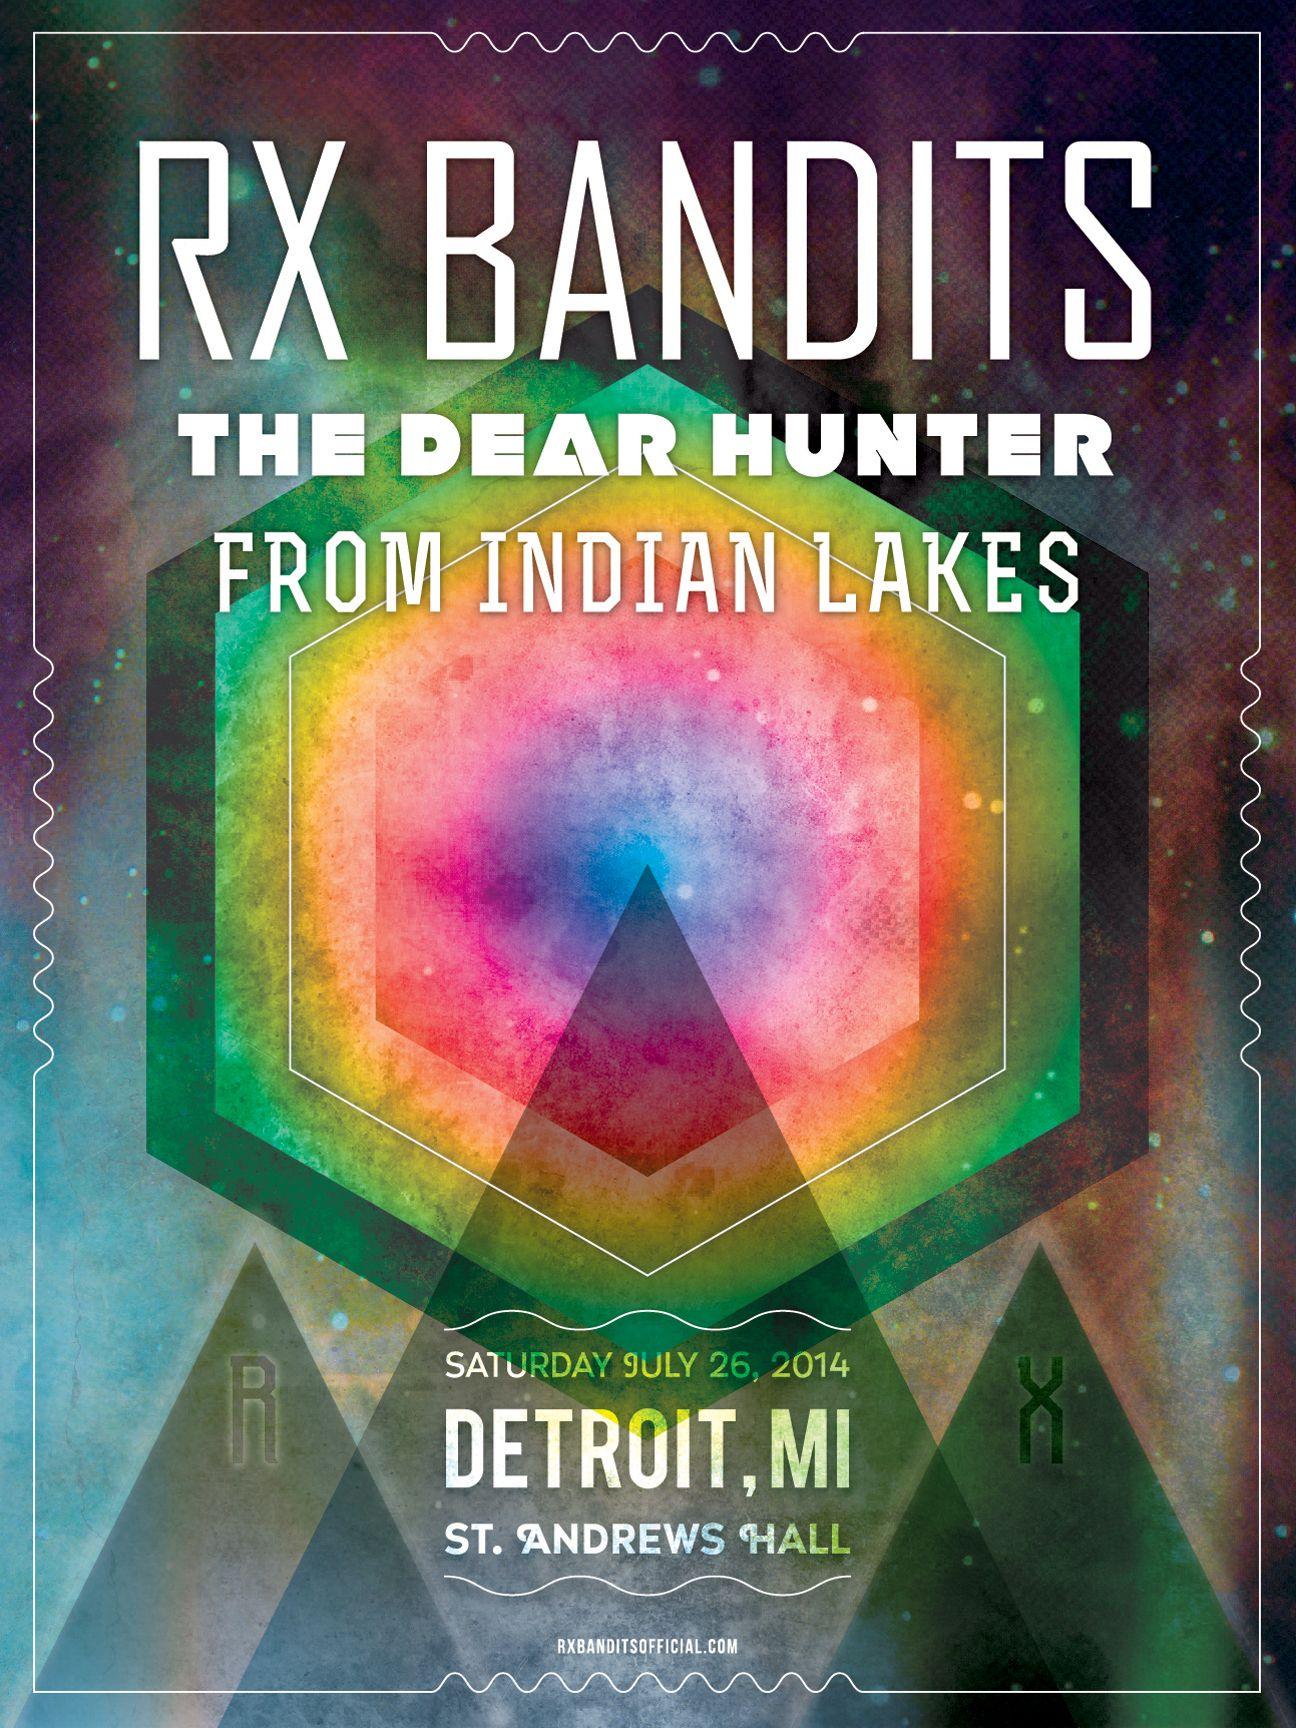 RX Bandits ~ St. Andrews ~ Detroit, MI